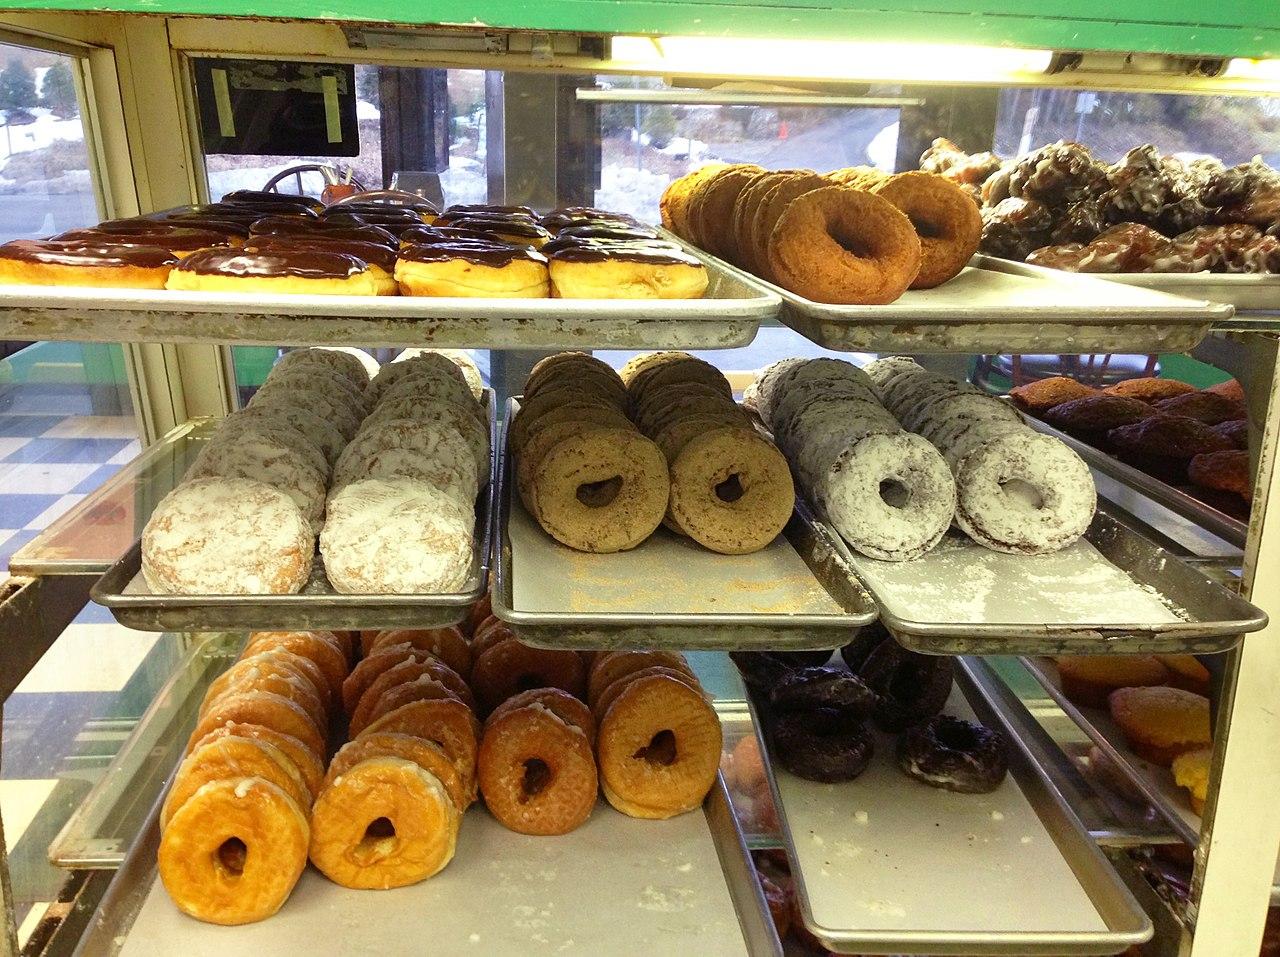 File:Donuts (Coffee An), Westport, CT 06880 USA - Feb 2013 ...